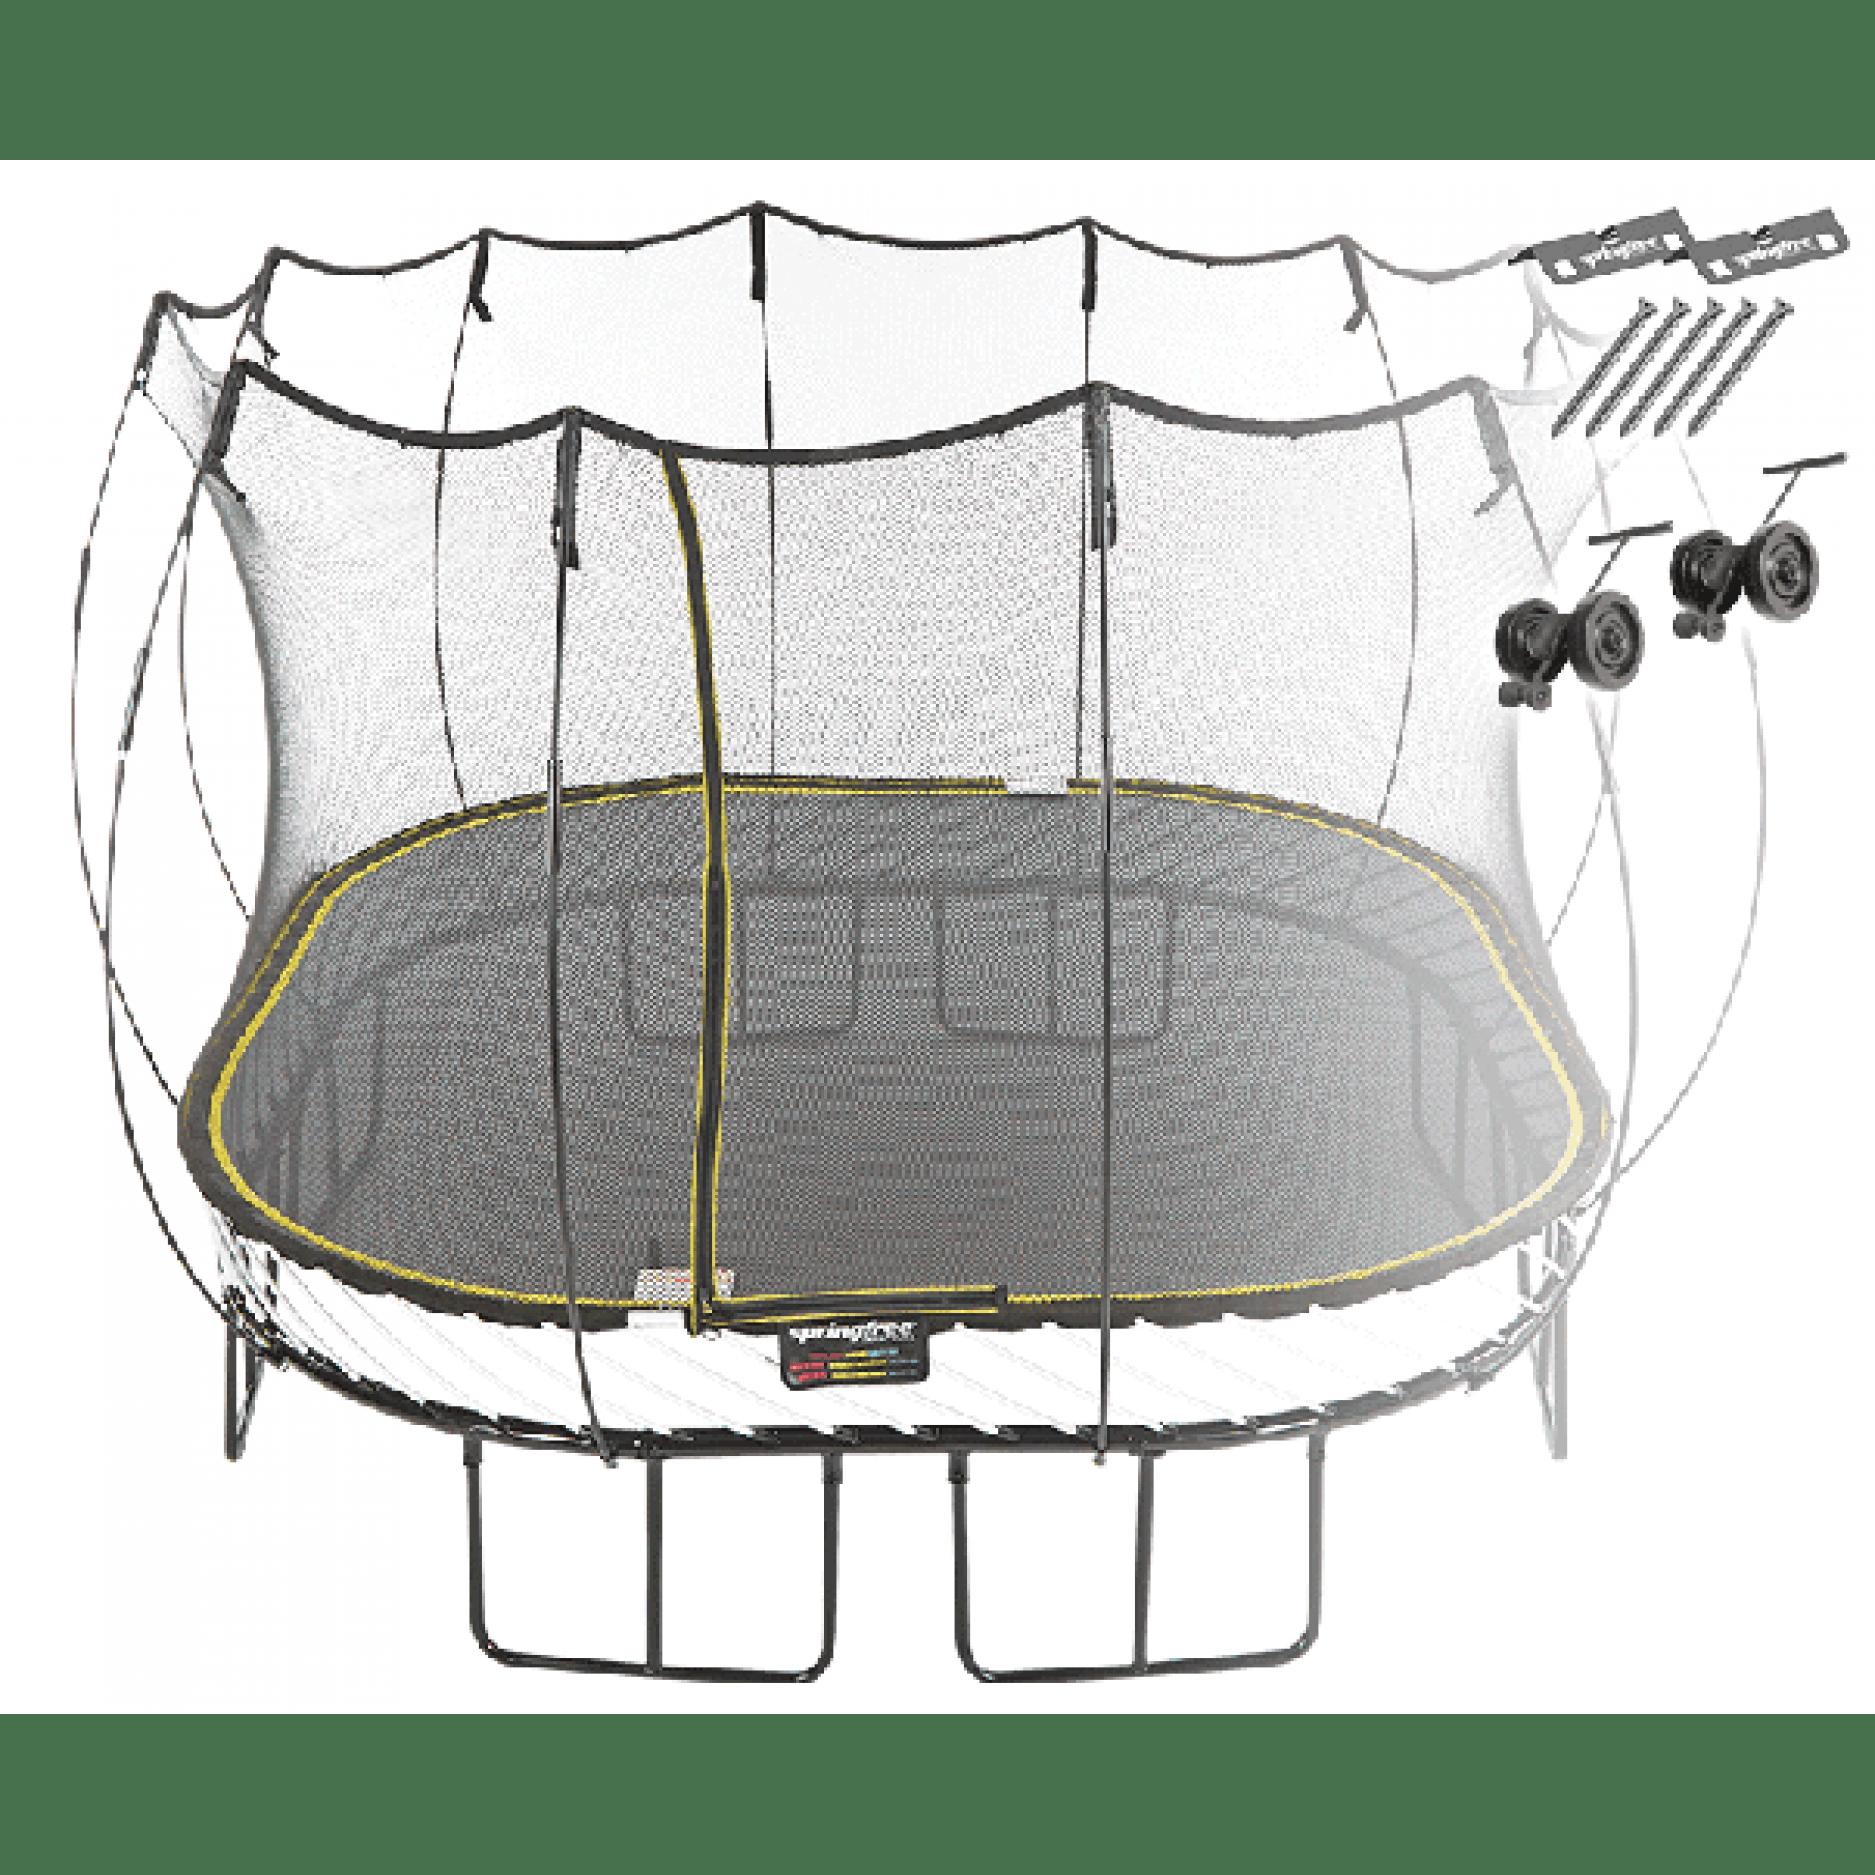 Батут квадратный Springfree S113 AW с фиксаторами и колесиками